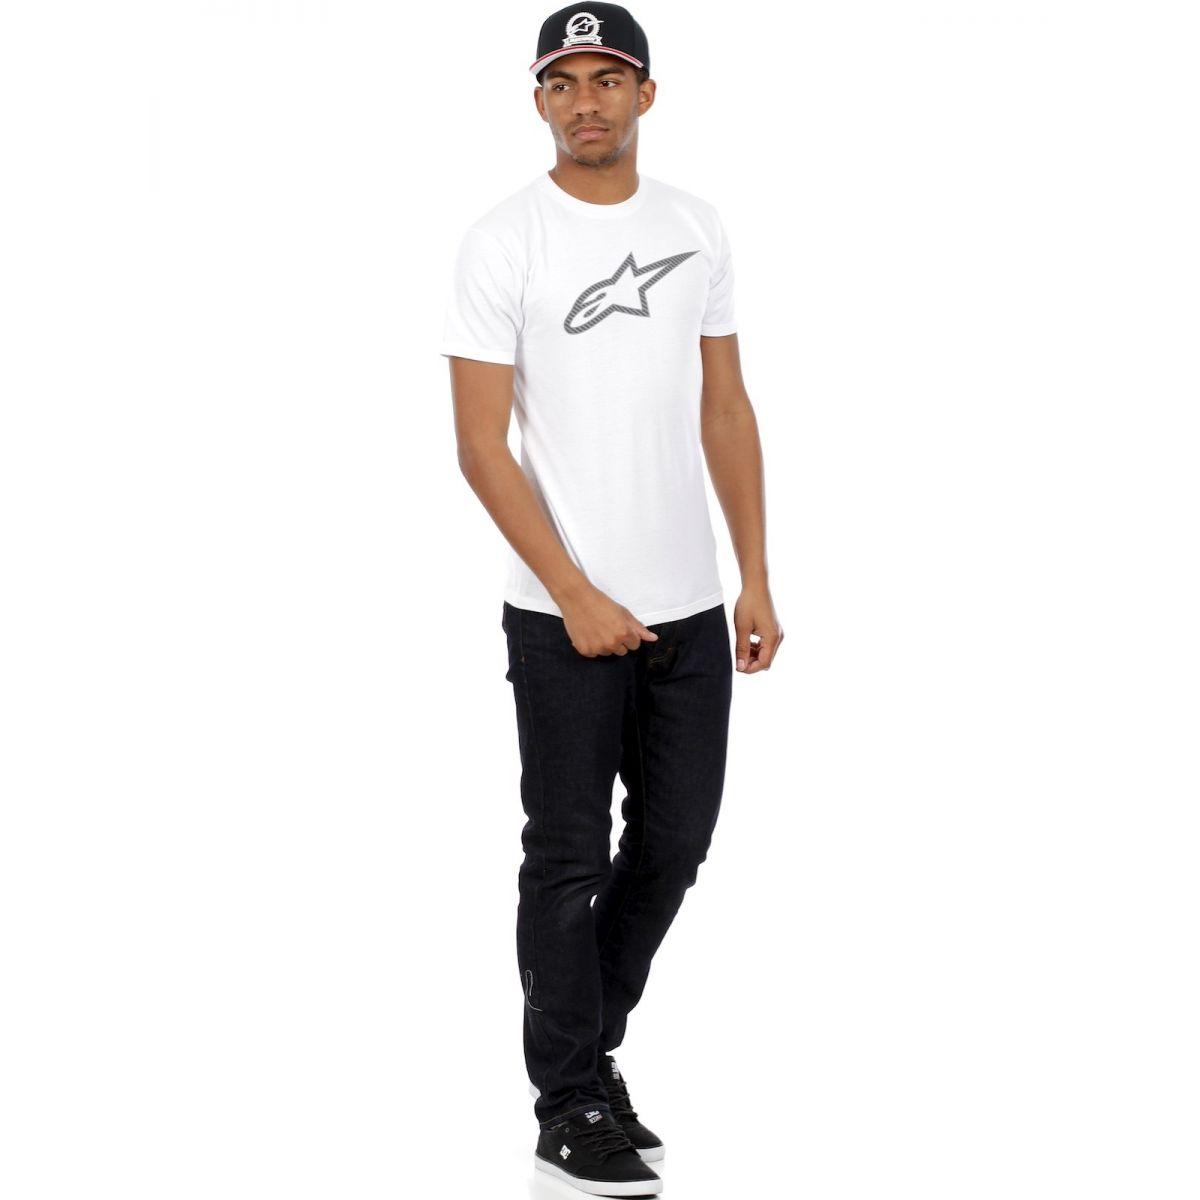 Camiseta Alpinestars Ageless Carbon White  - Super Bike - Loja Oficial Alpinestars